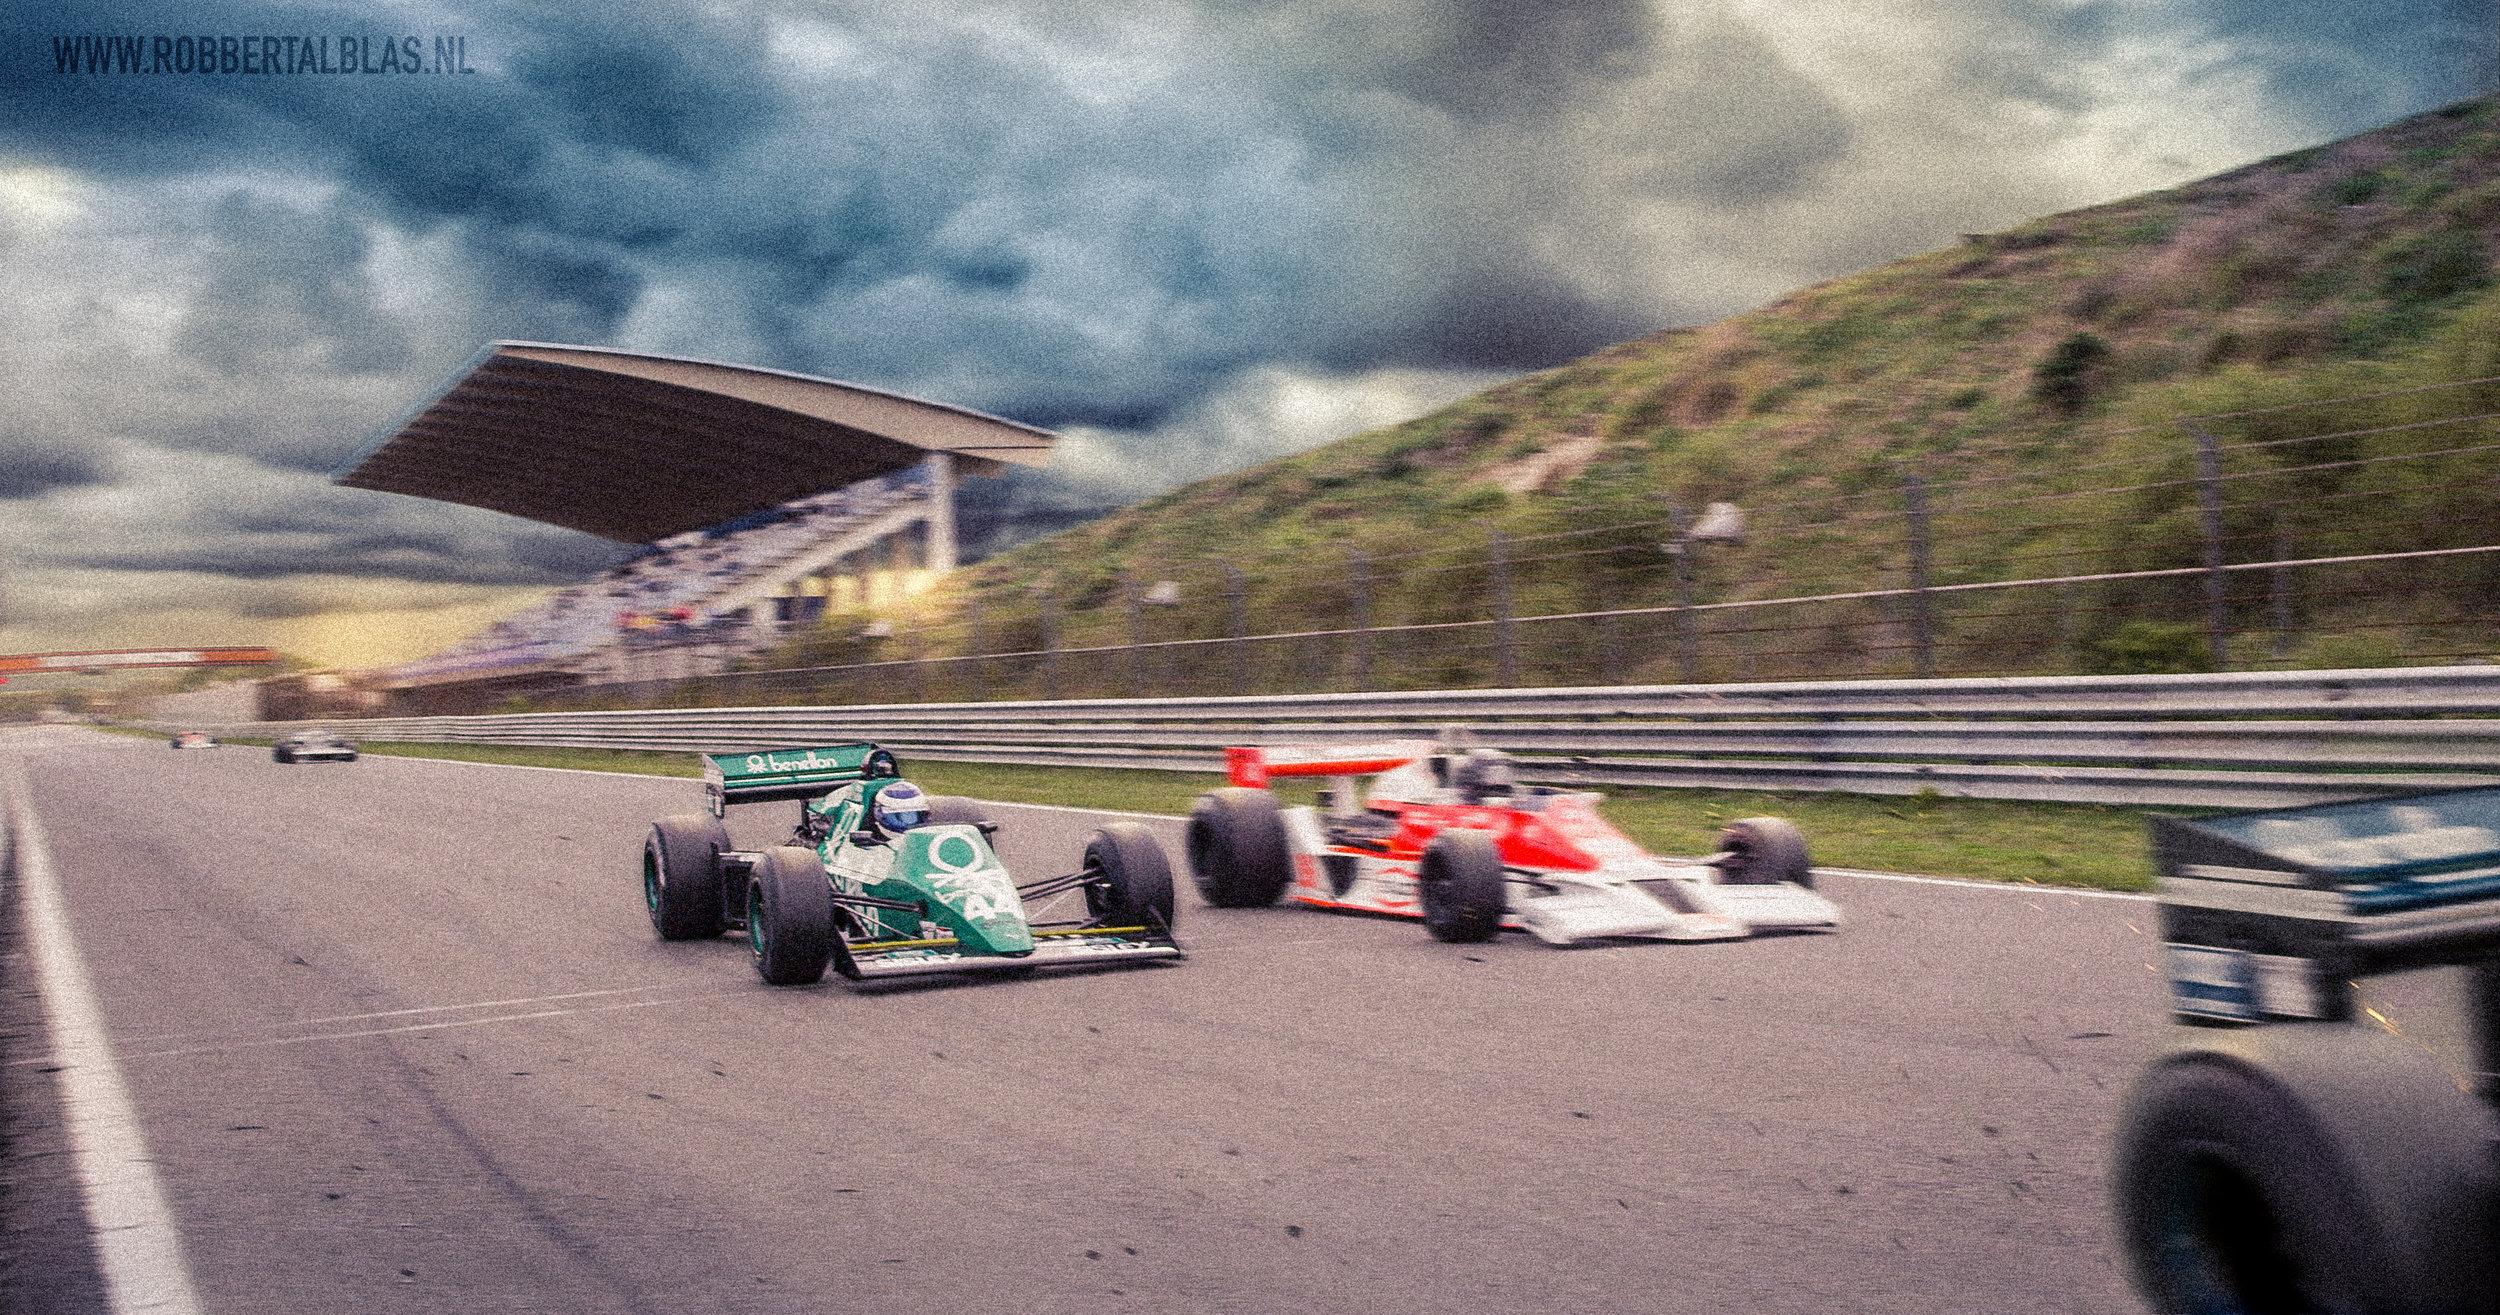 F1 Robbert Alblas historic grand prix.jpg